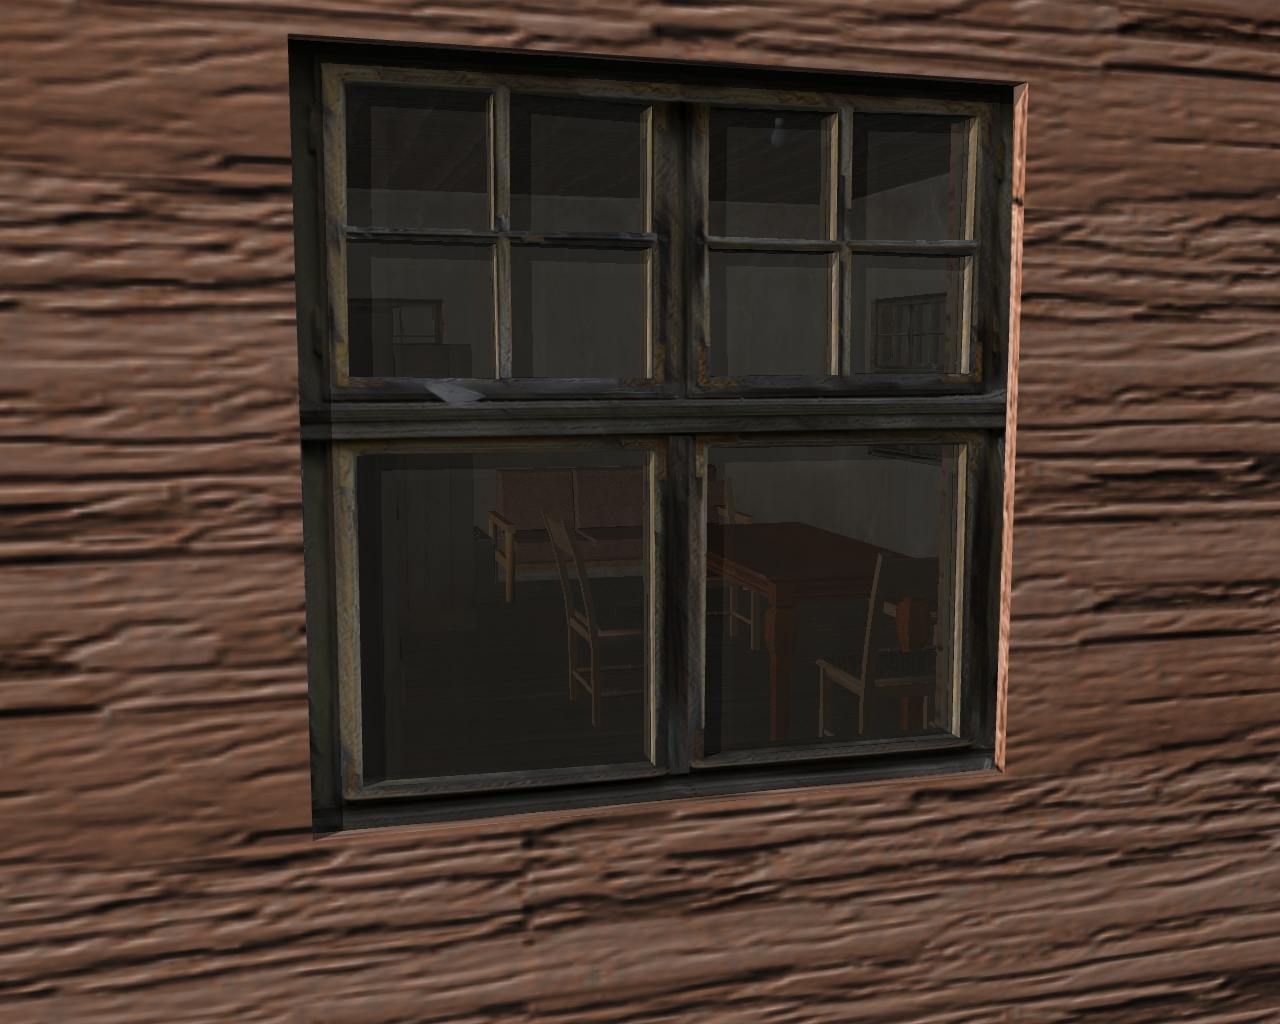 wooden house 2 3d model 3ds 166196